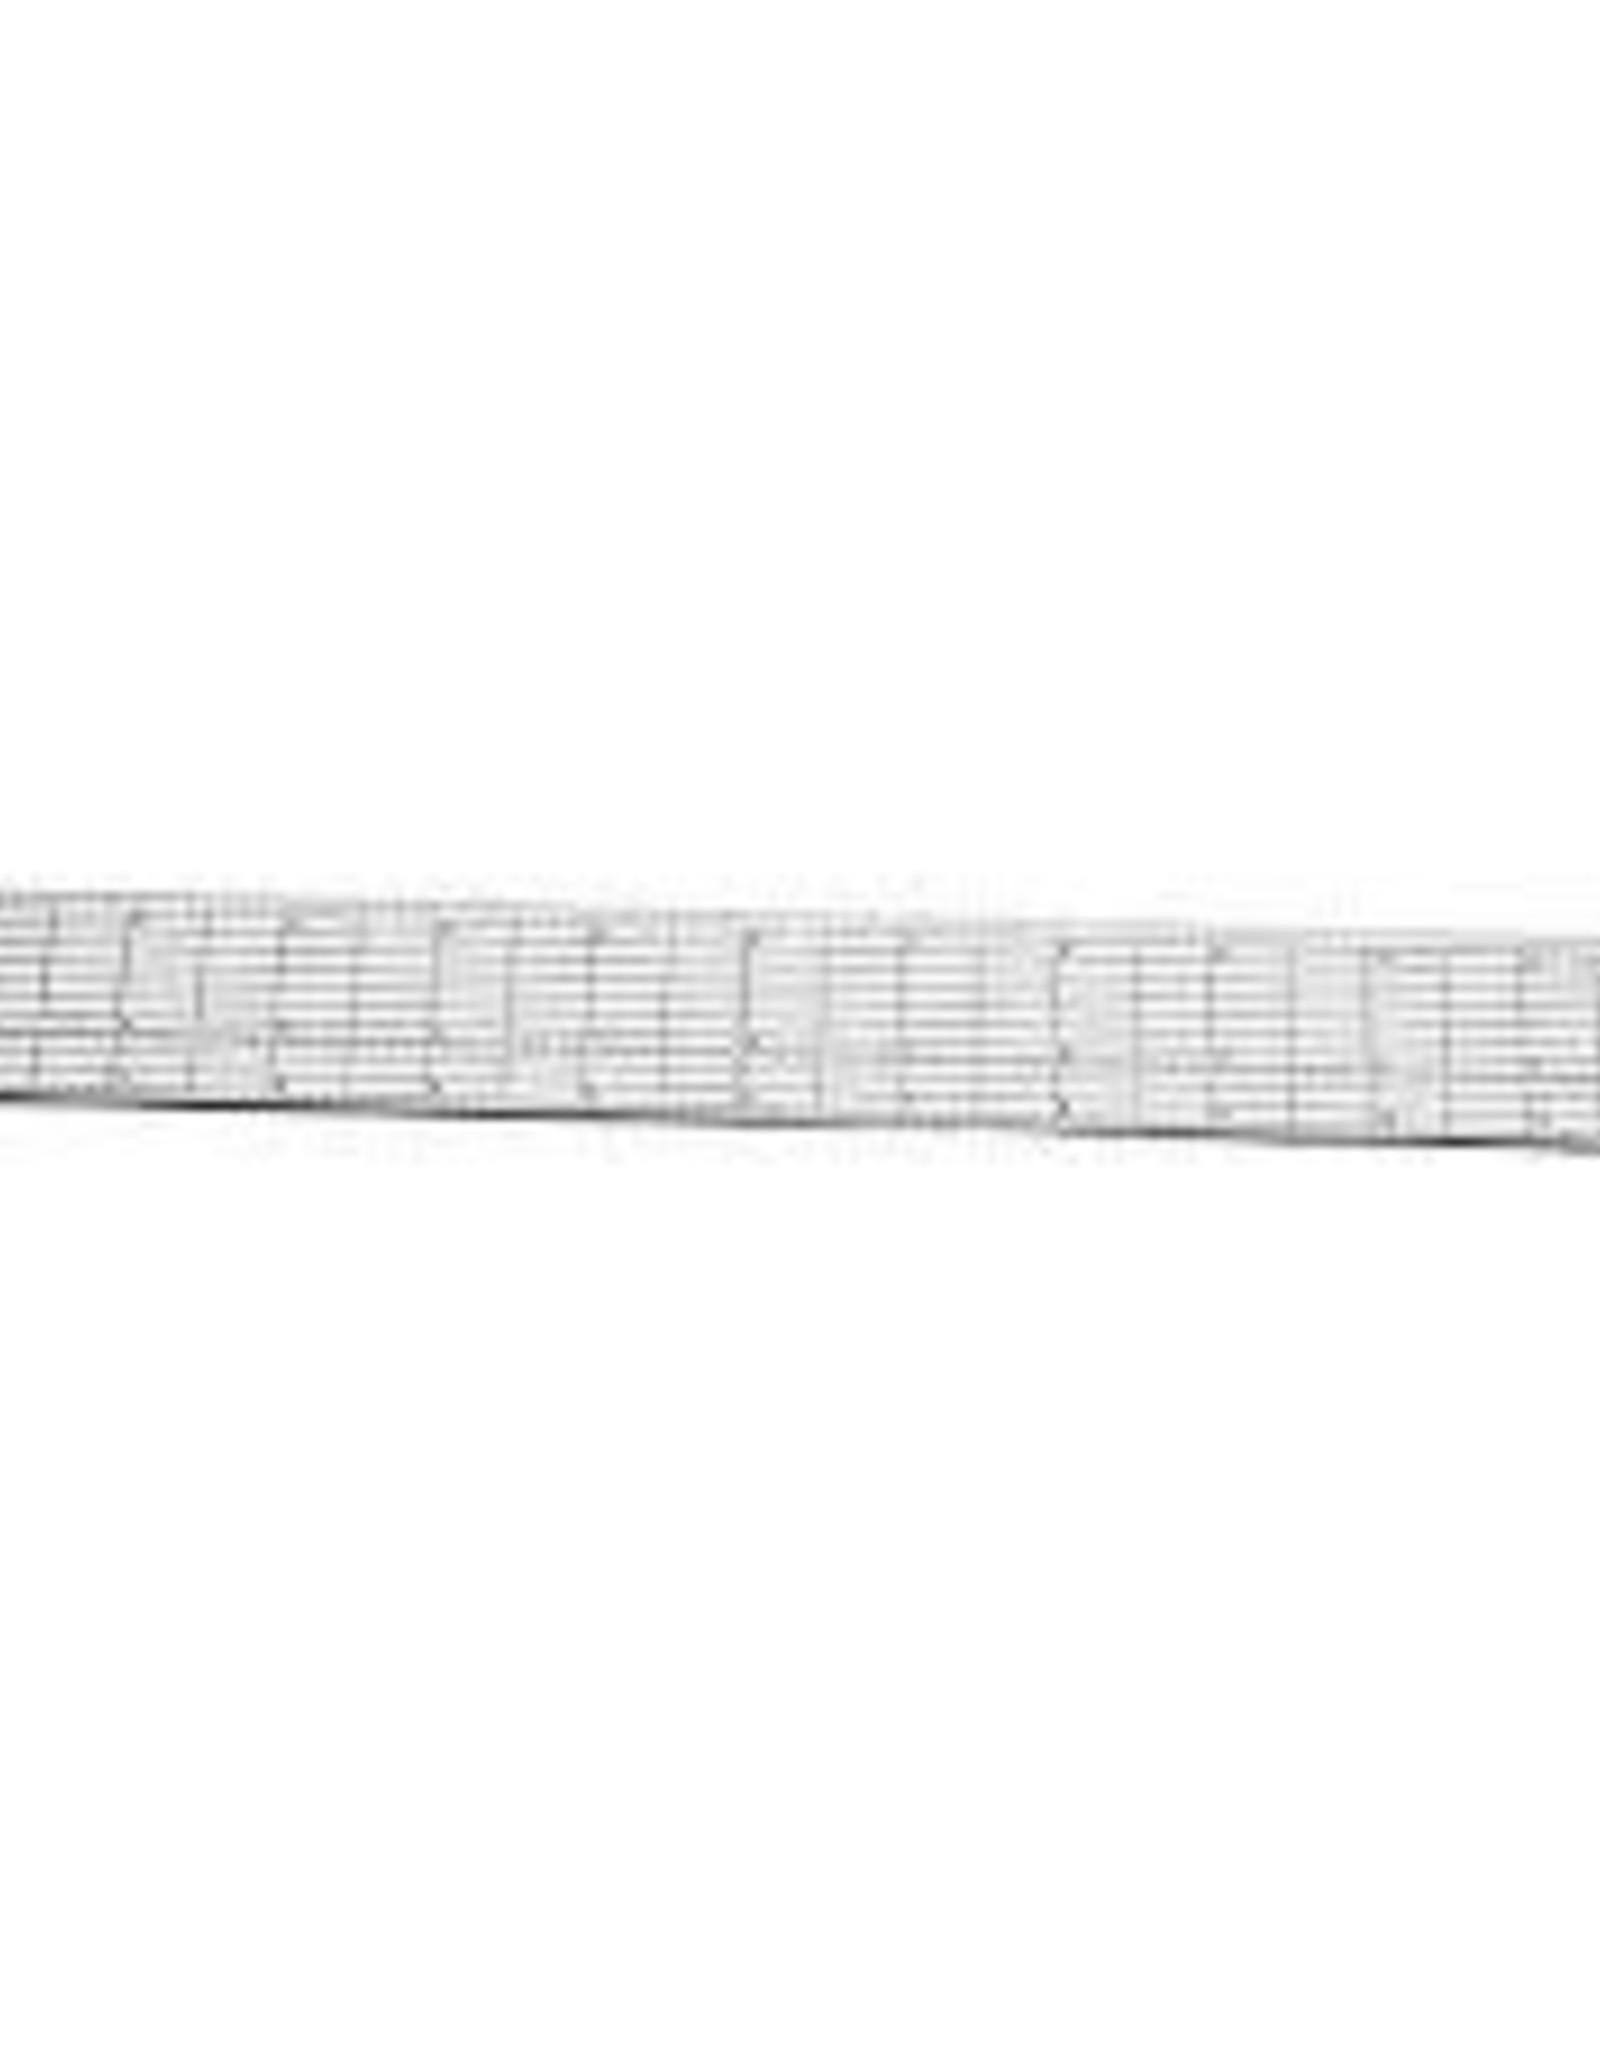 Wescott 1.5 x 18.5 Grid Ruler with Metal Cutting Edge